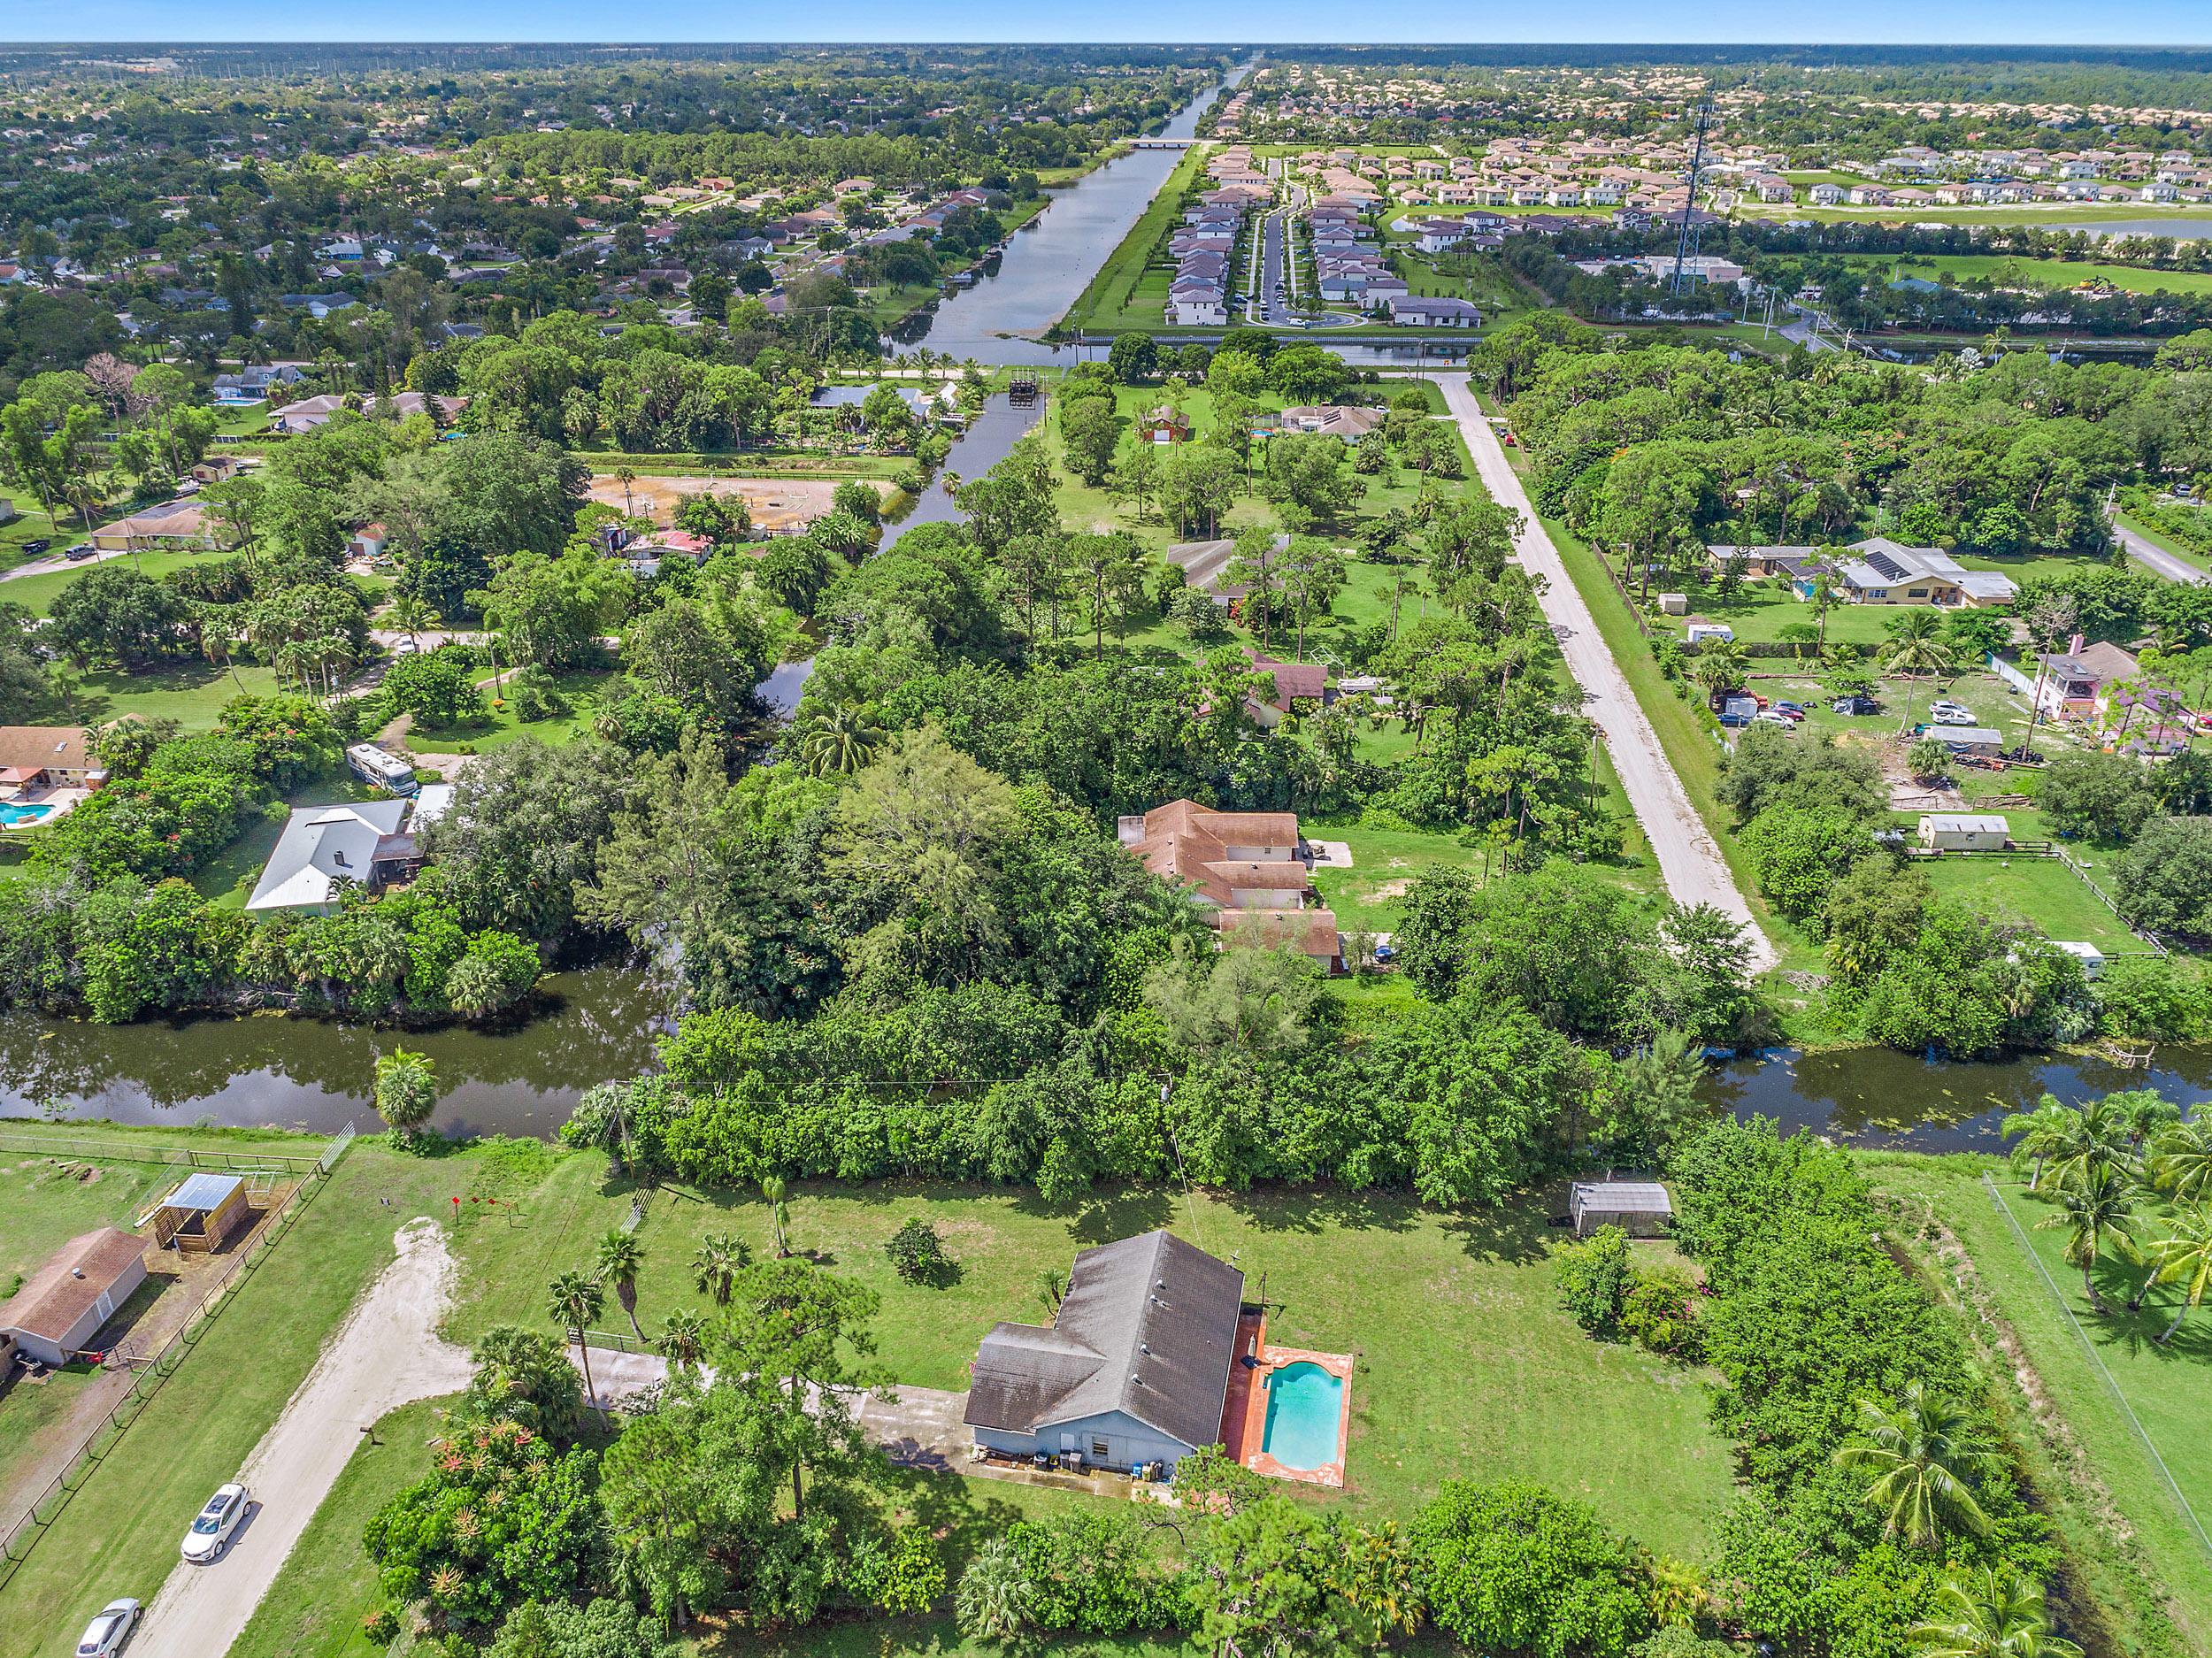 4210 120th Avenue The Acreage, FL 33411 photo 25